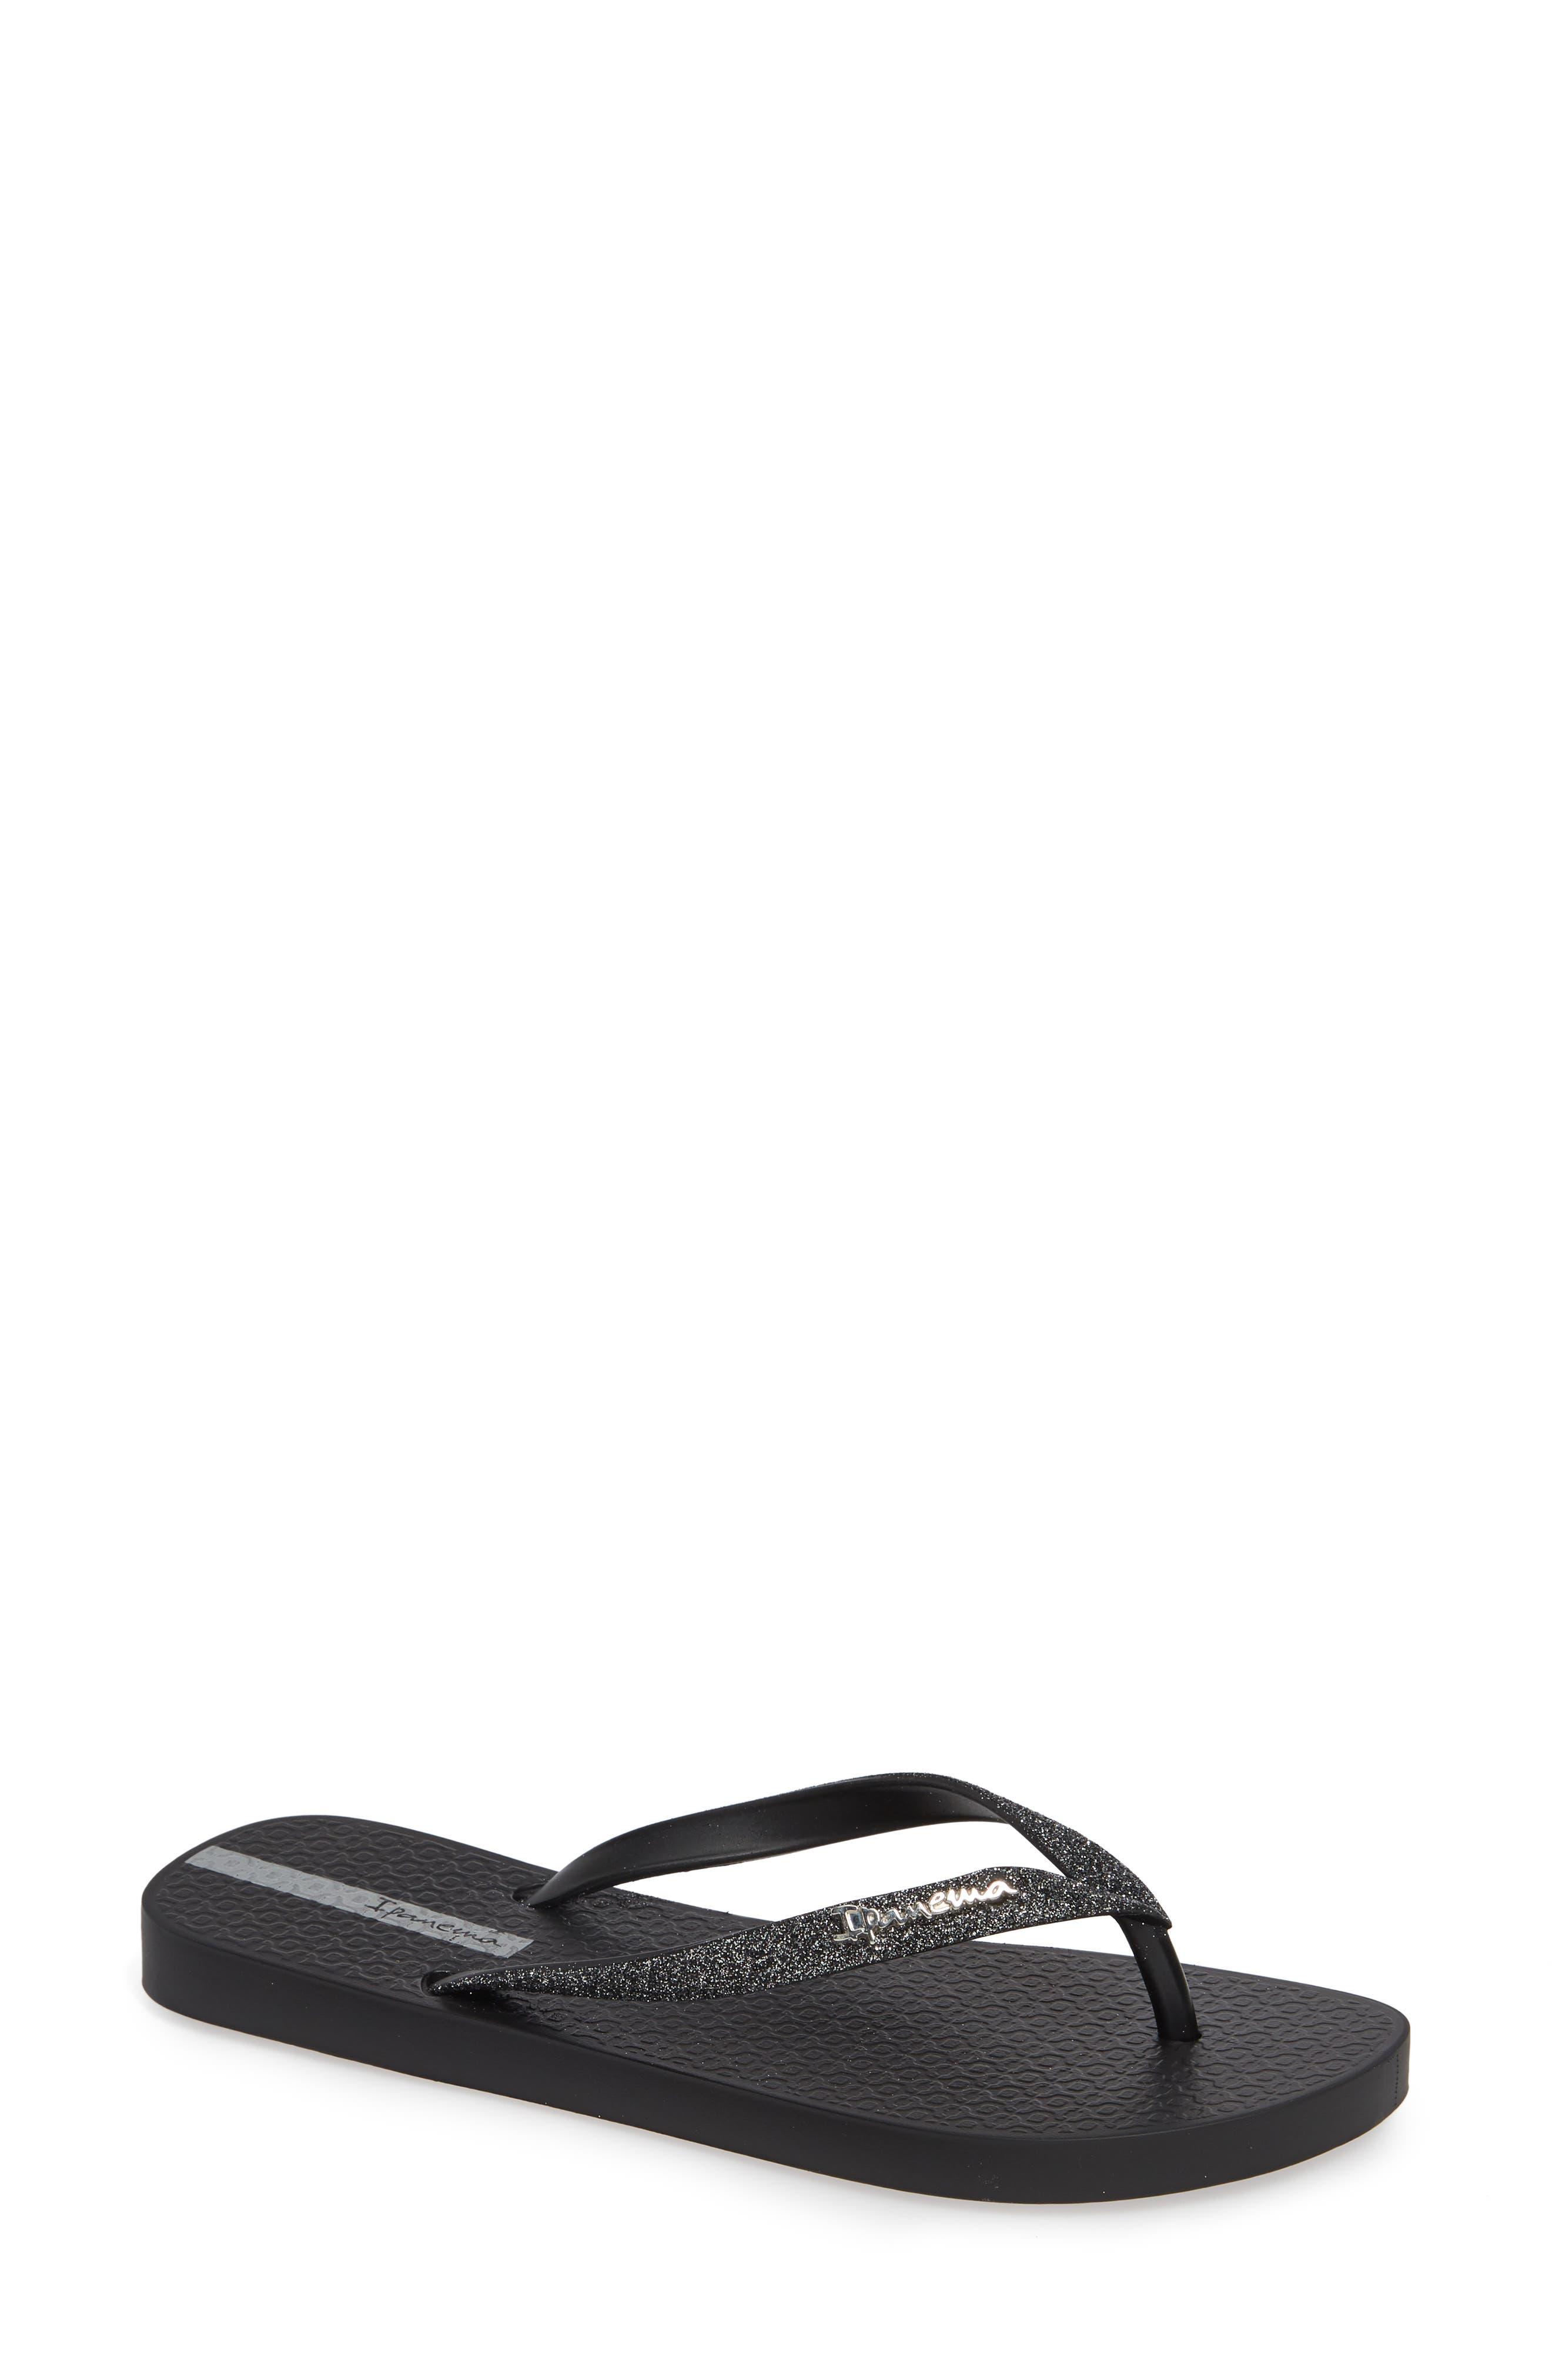 IPANEMA 'Glitter' Flip Flop, Main, color, BLACK/ BLACK